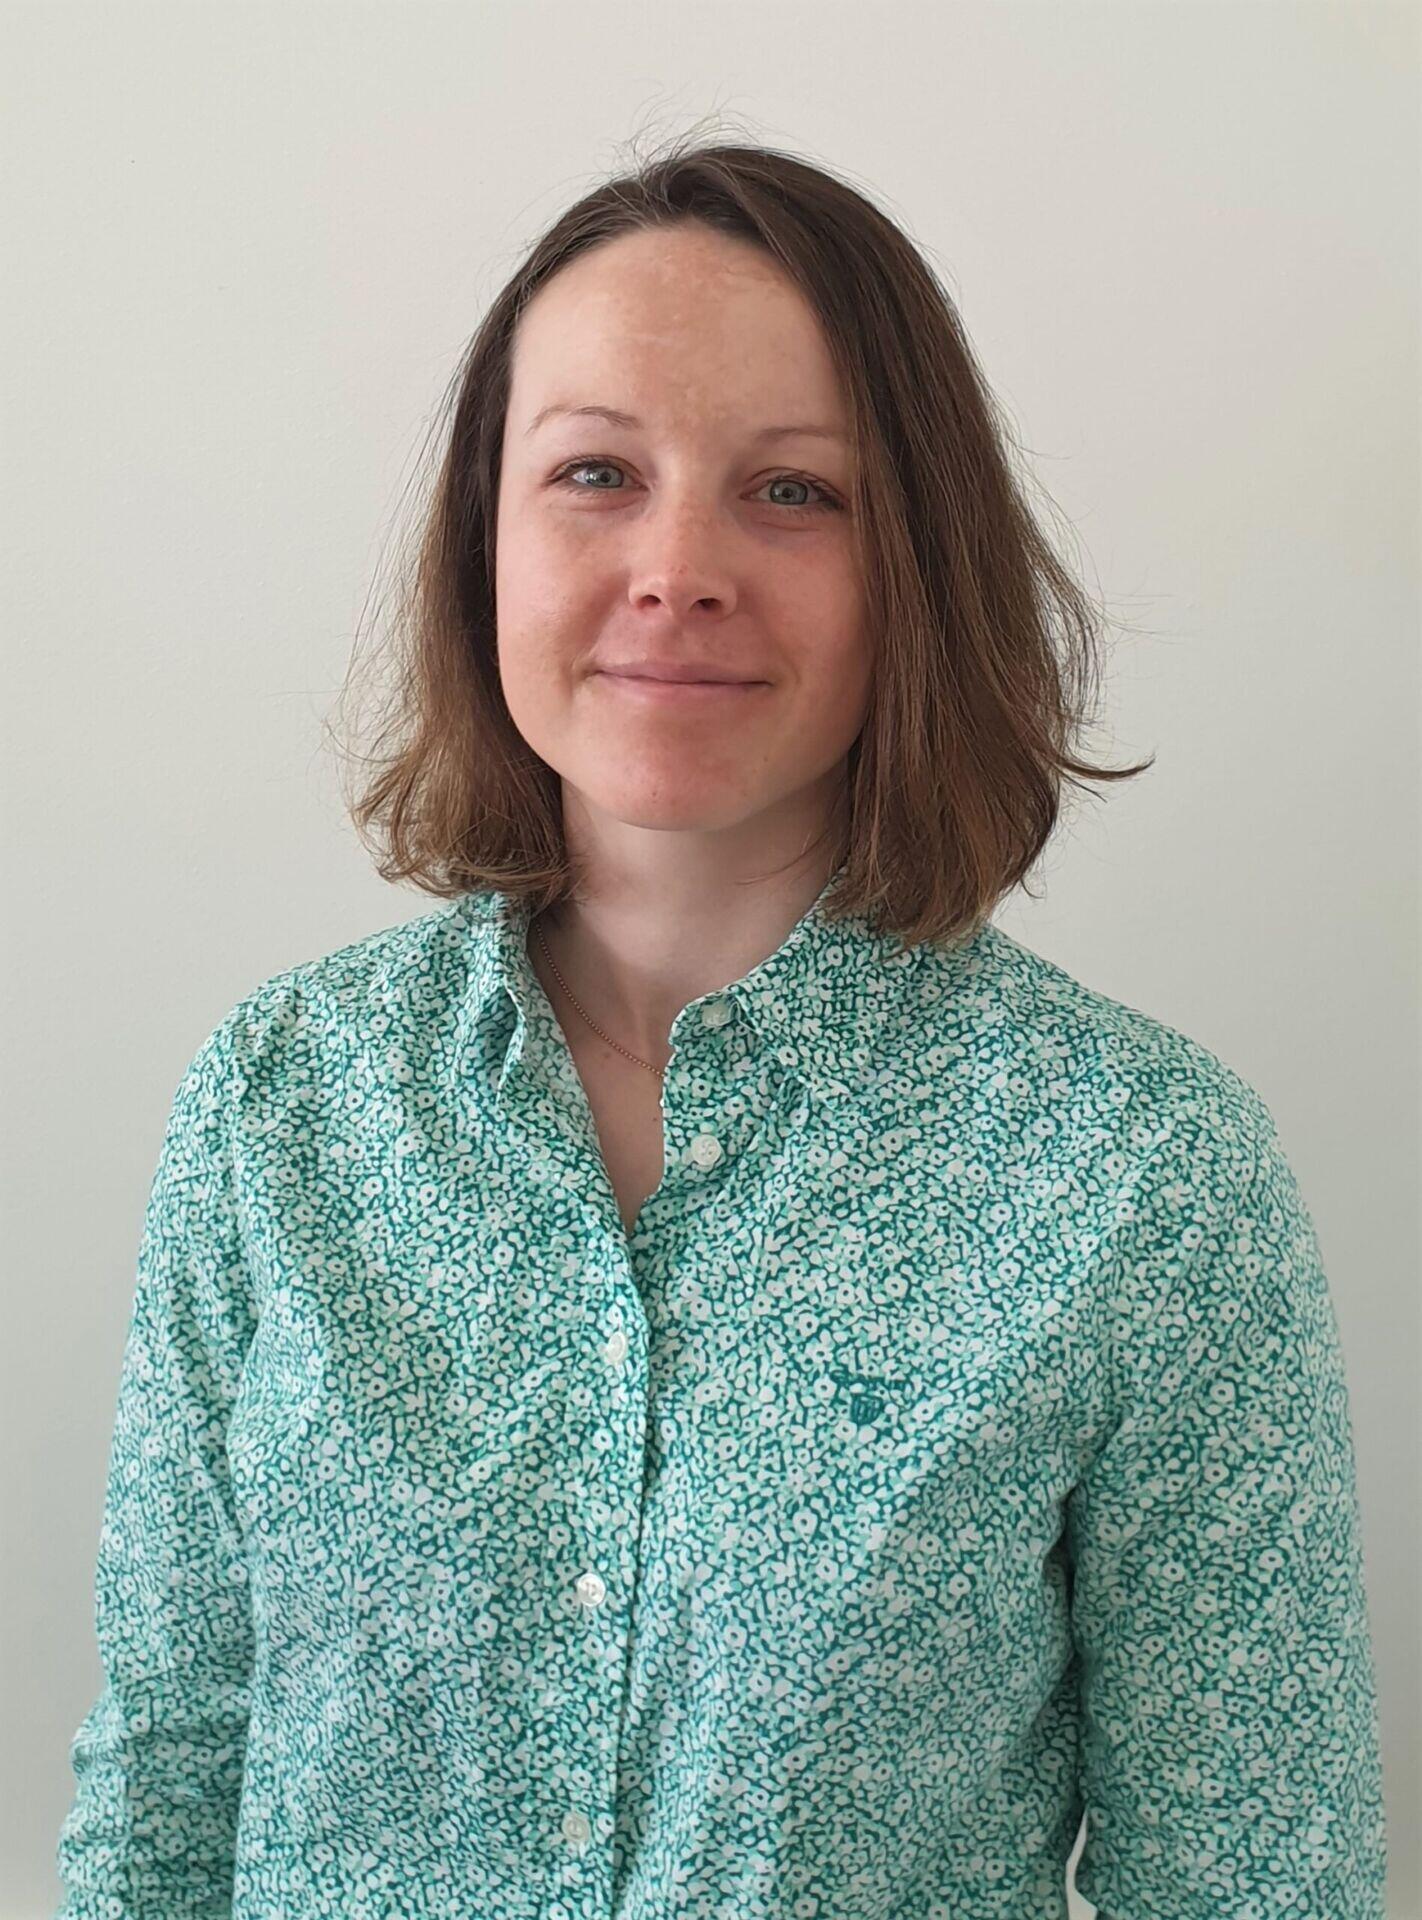 Edith Brodda Jansen